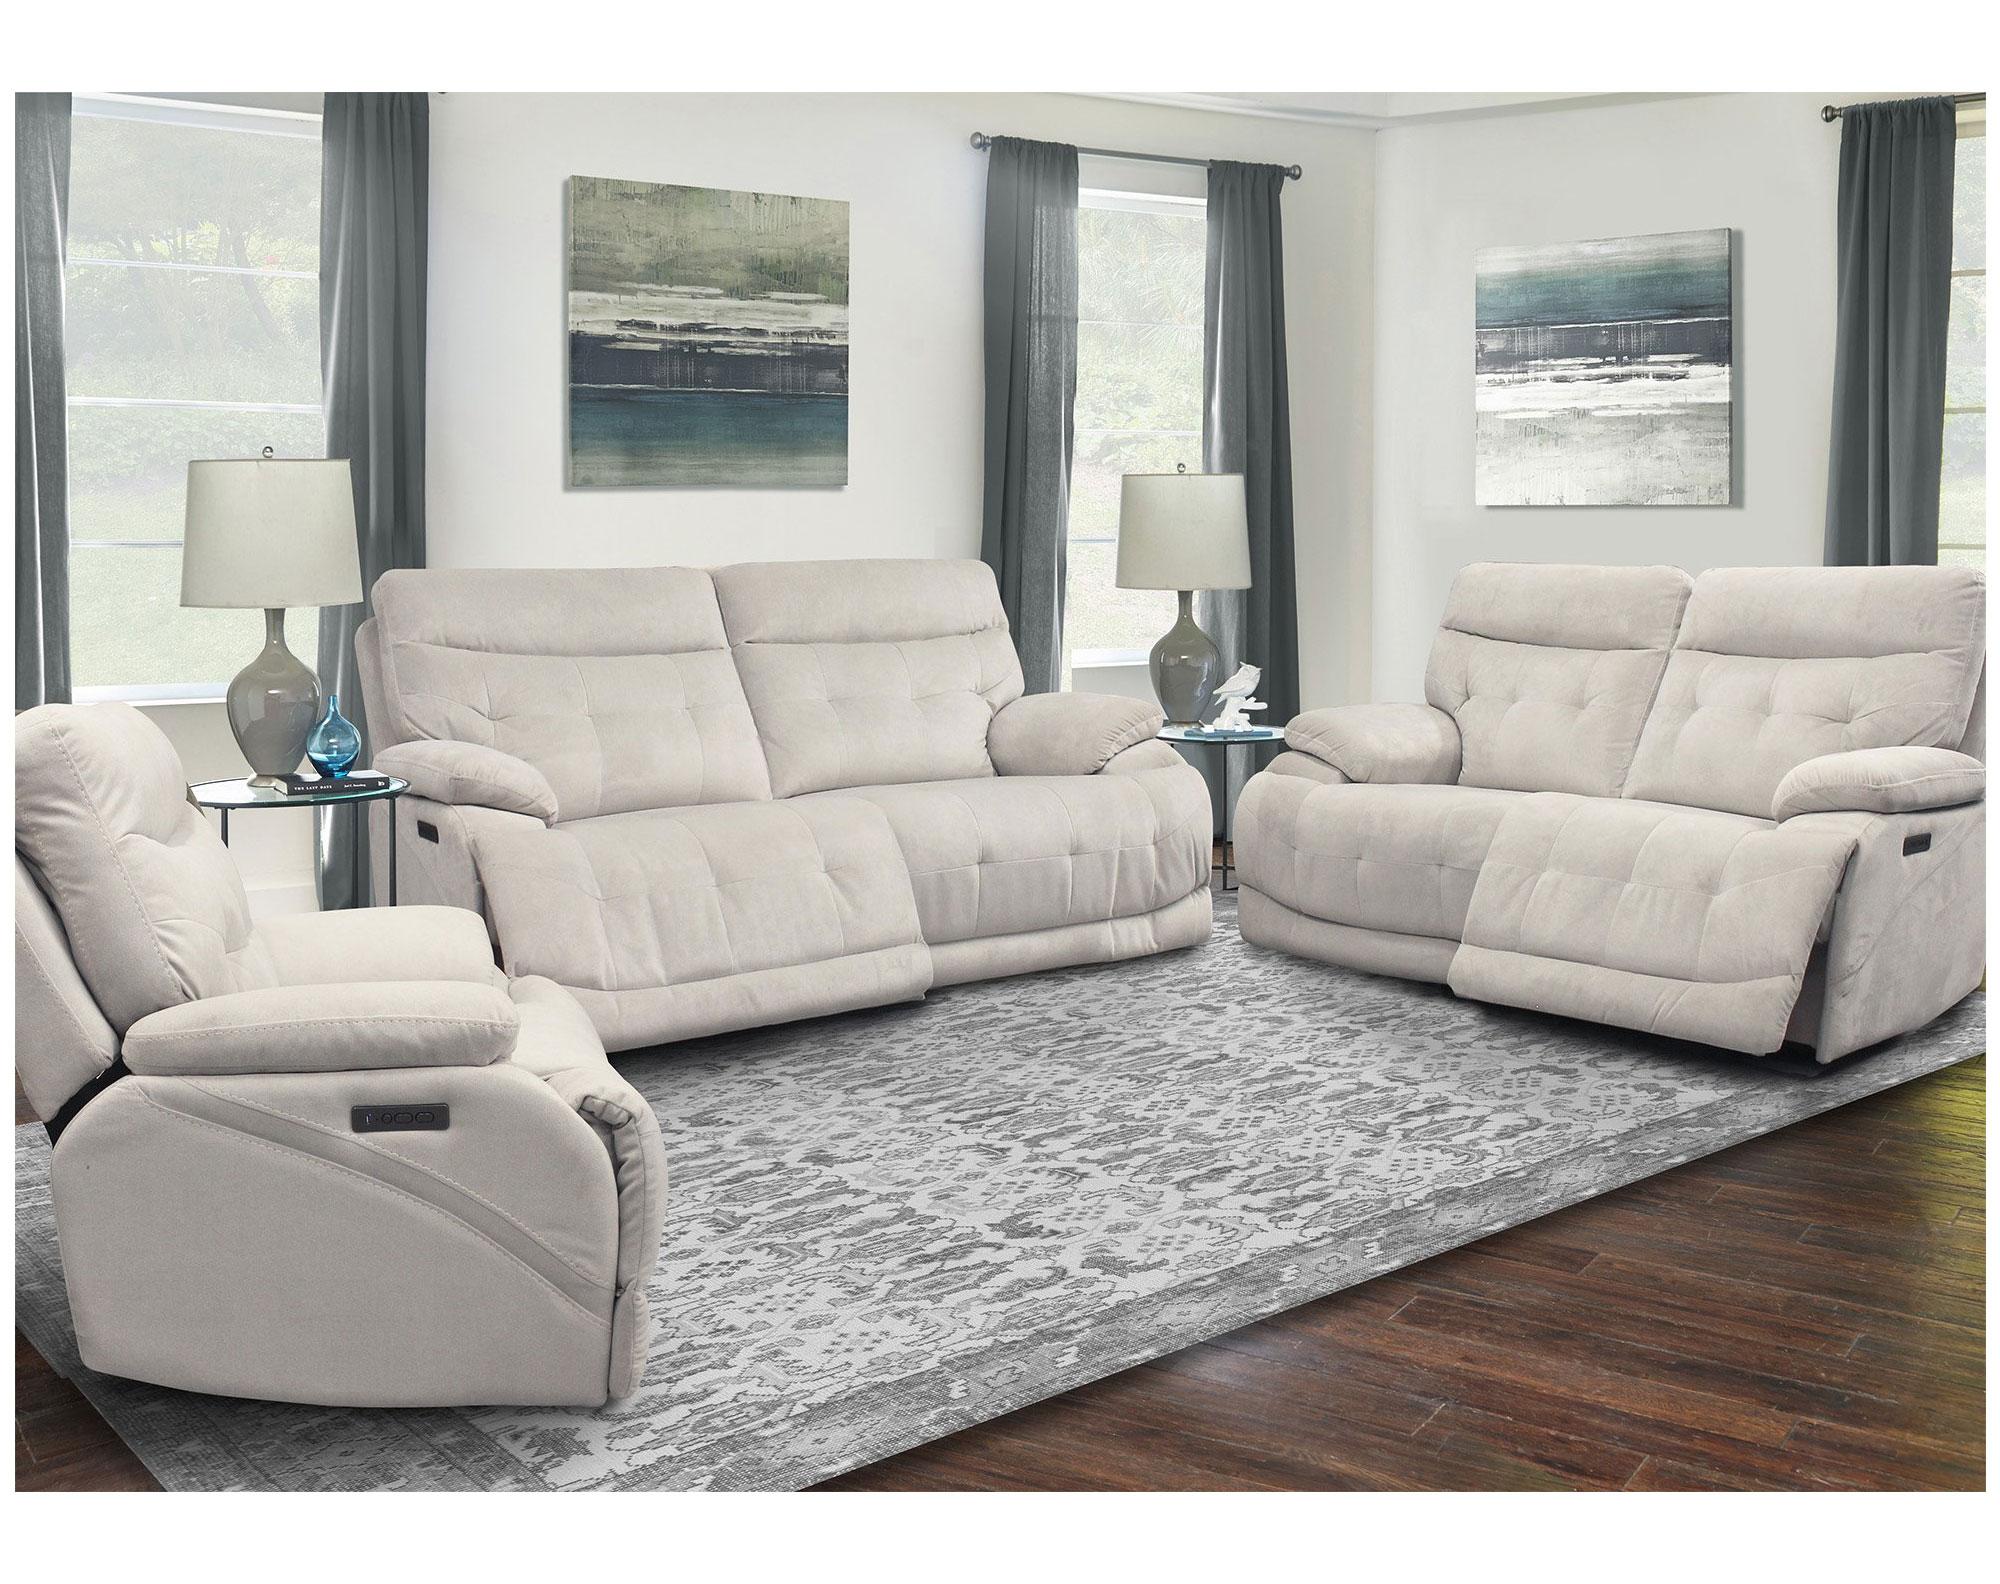 Enjoyable Stratus Cozy Power Sofa With Power Headrest Sofas And Ibusinesslaw Wood Chair Design Ideas Ibusinesslaworg